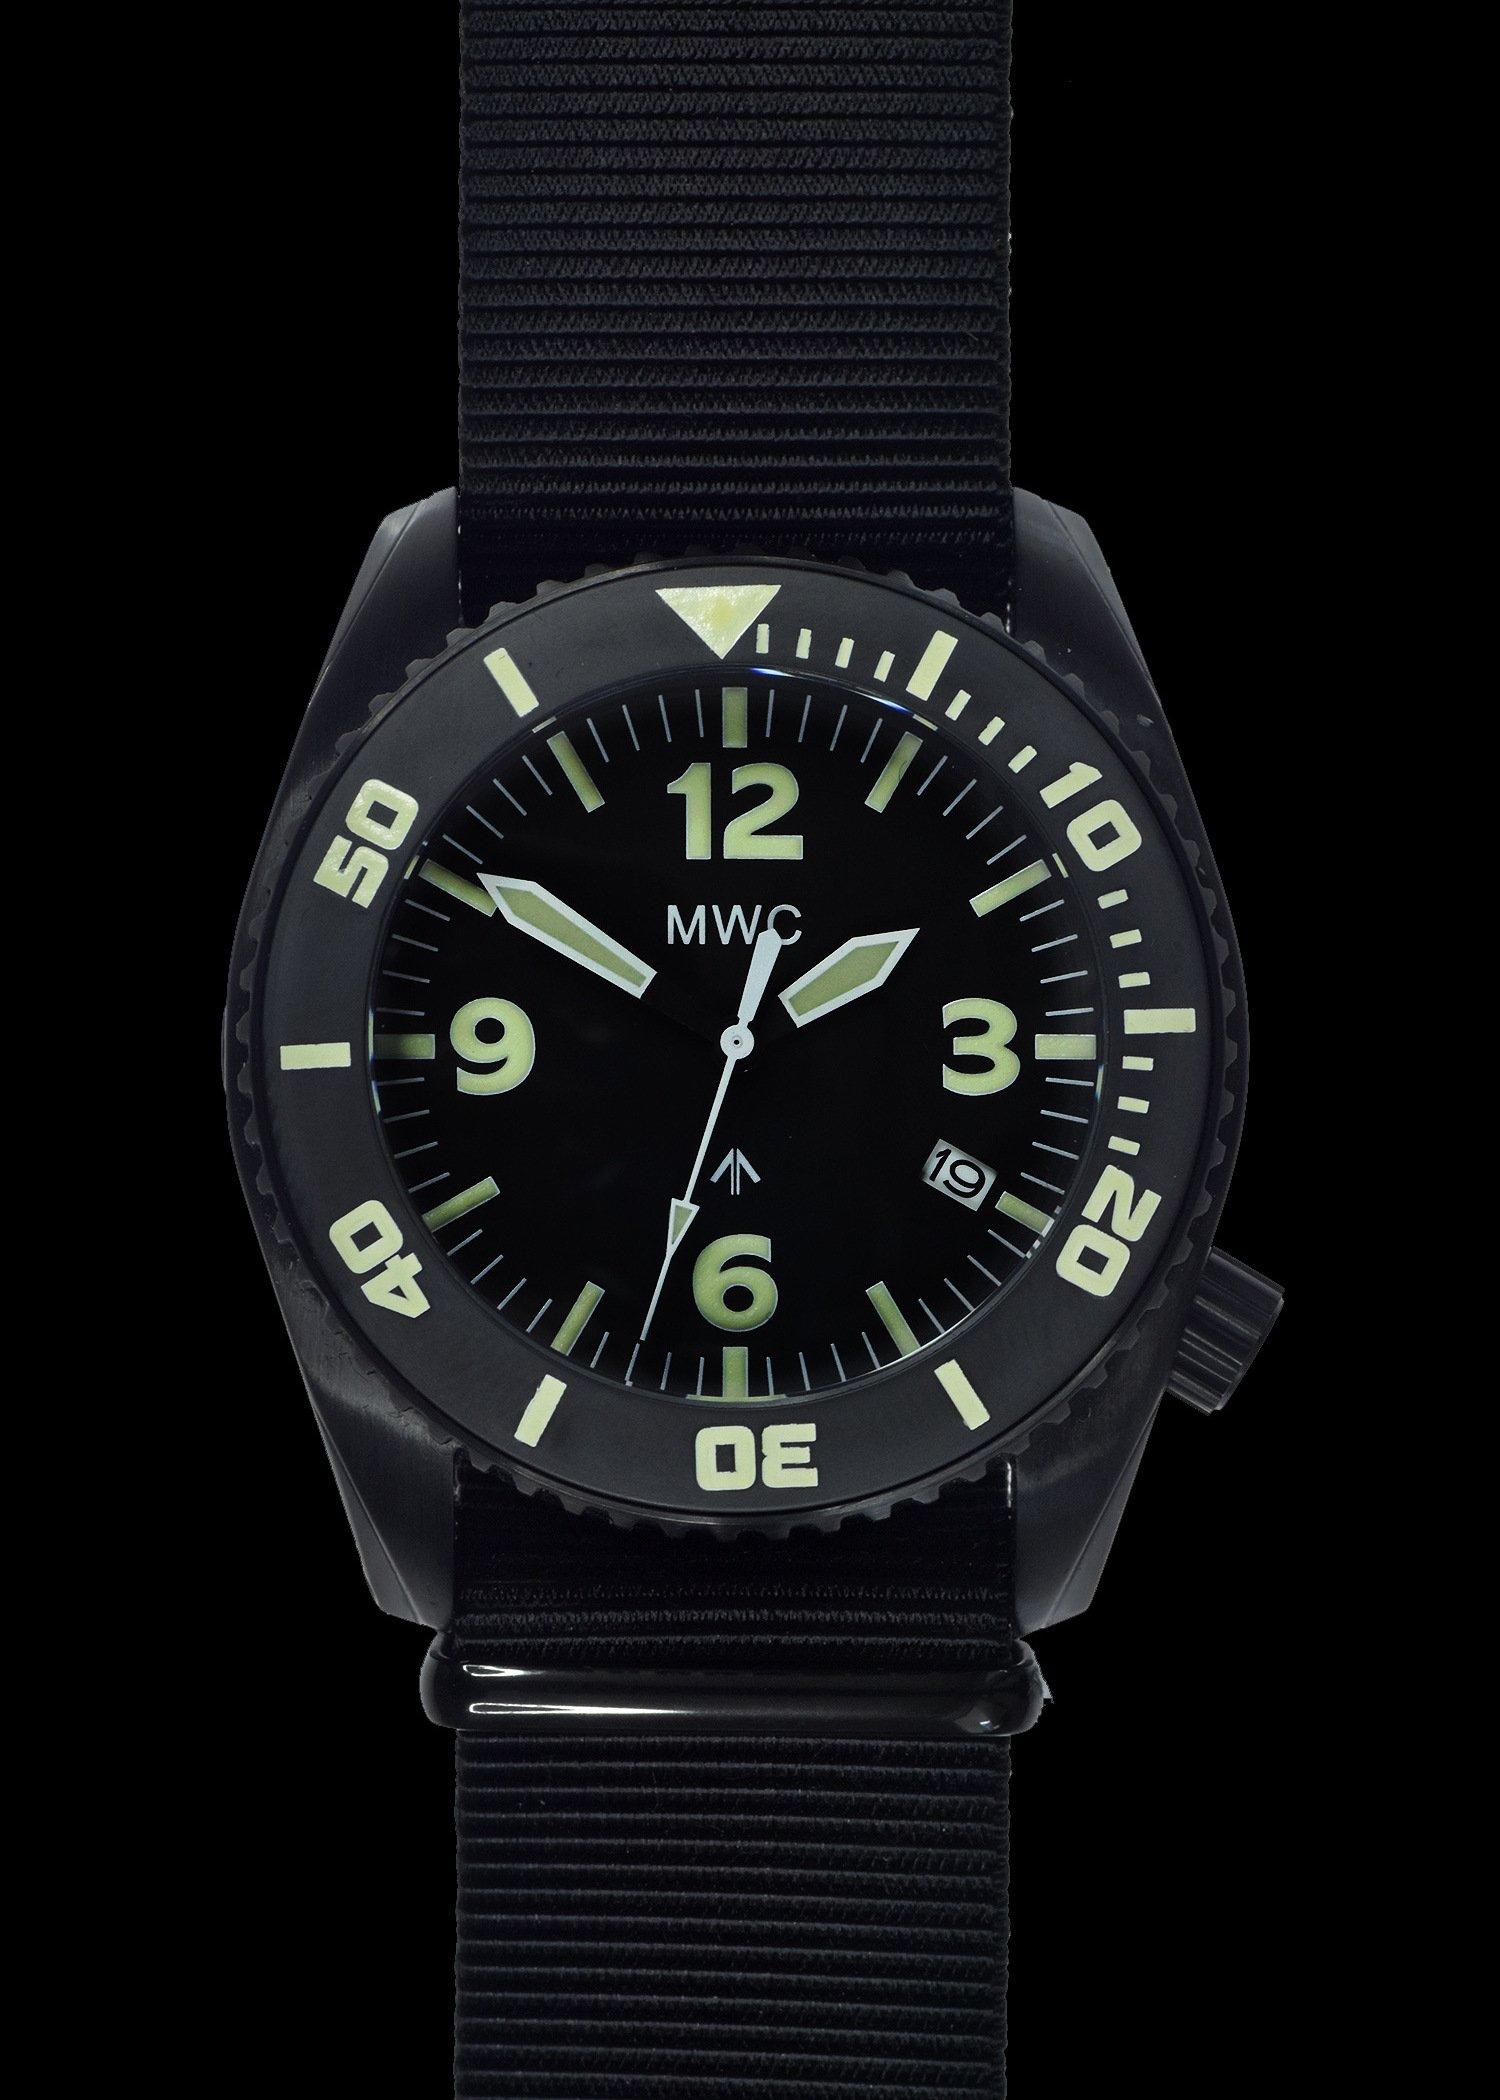 Водолазен часовник DEPTHMASTER Quartz 1000m / 100atm Military Divers Helium – MWC